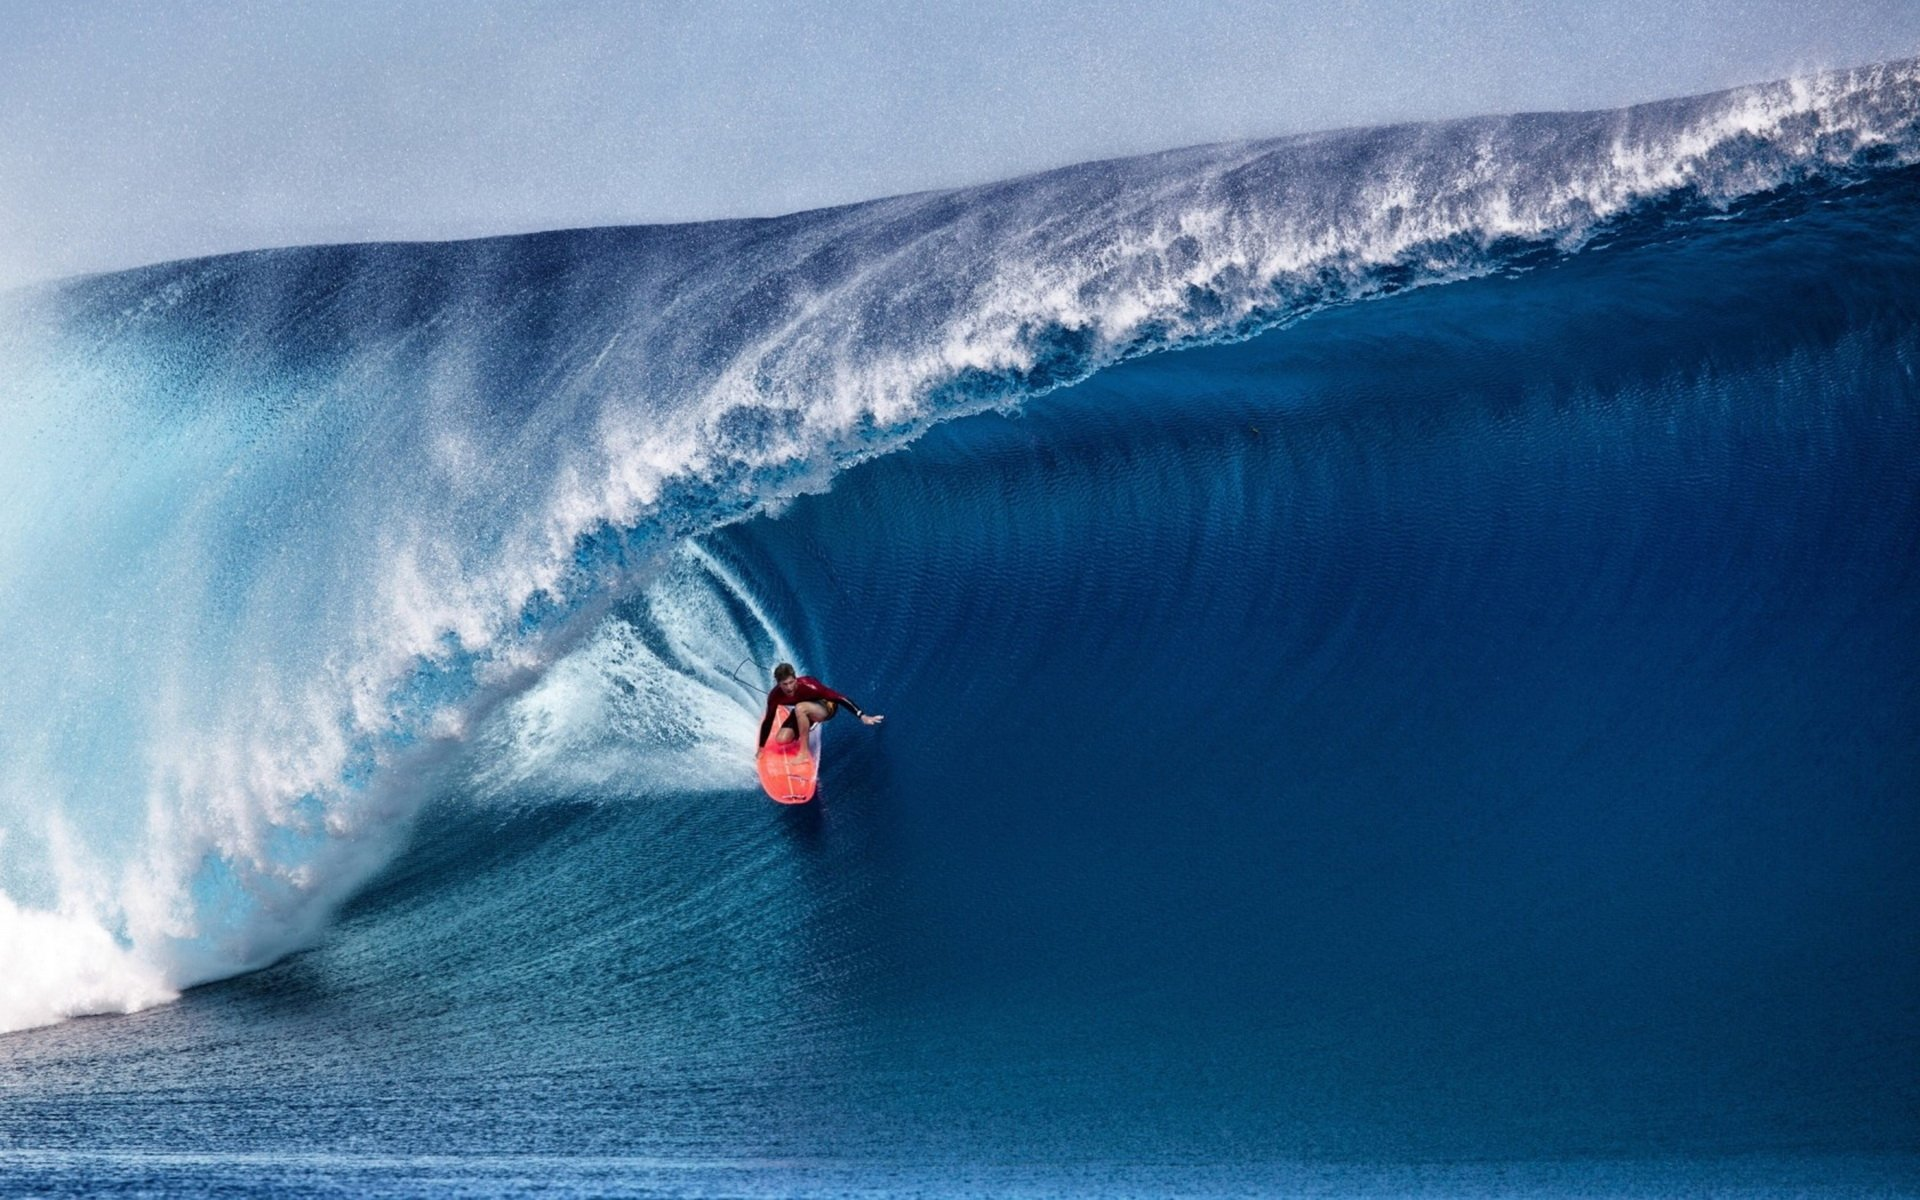 Surf Wallpaper Iphone X Surf Fondo De Pantalla Hd Fondo De Escritorio